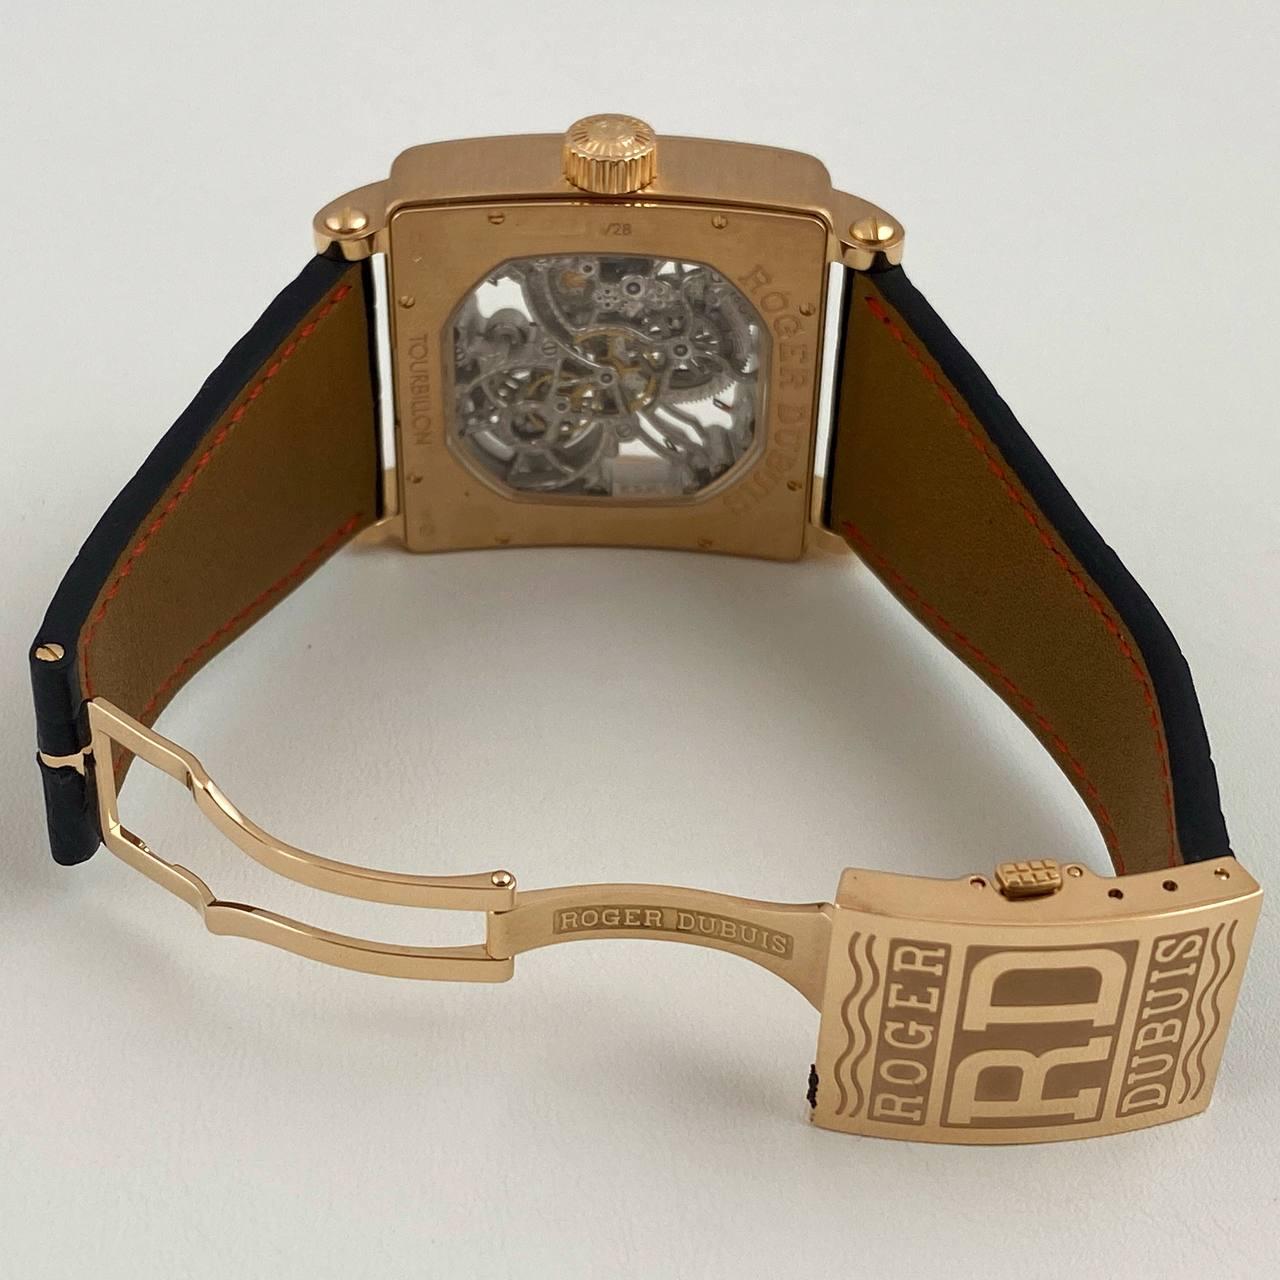 Часы Roger Dubuis GoldensQuare G40 02SQ 5 V.10A